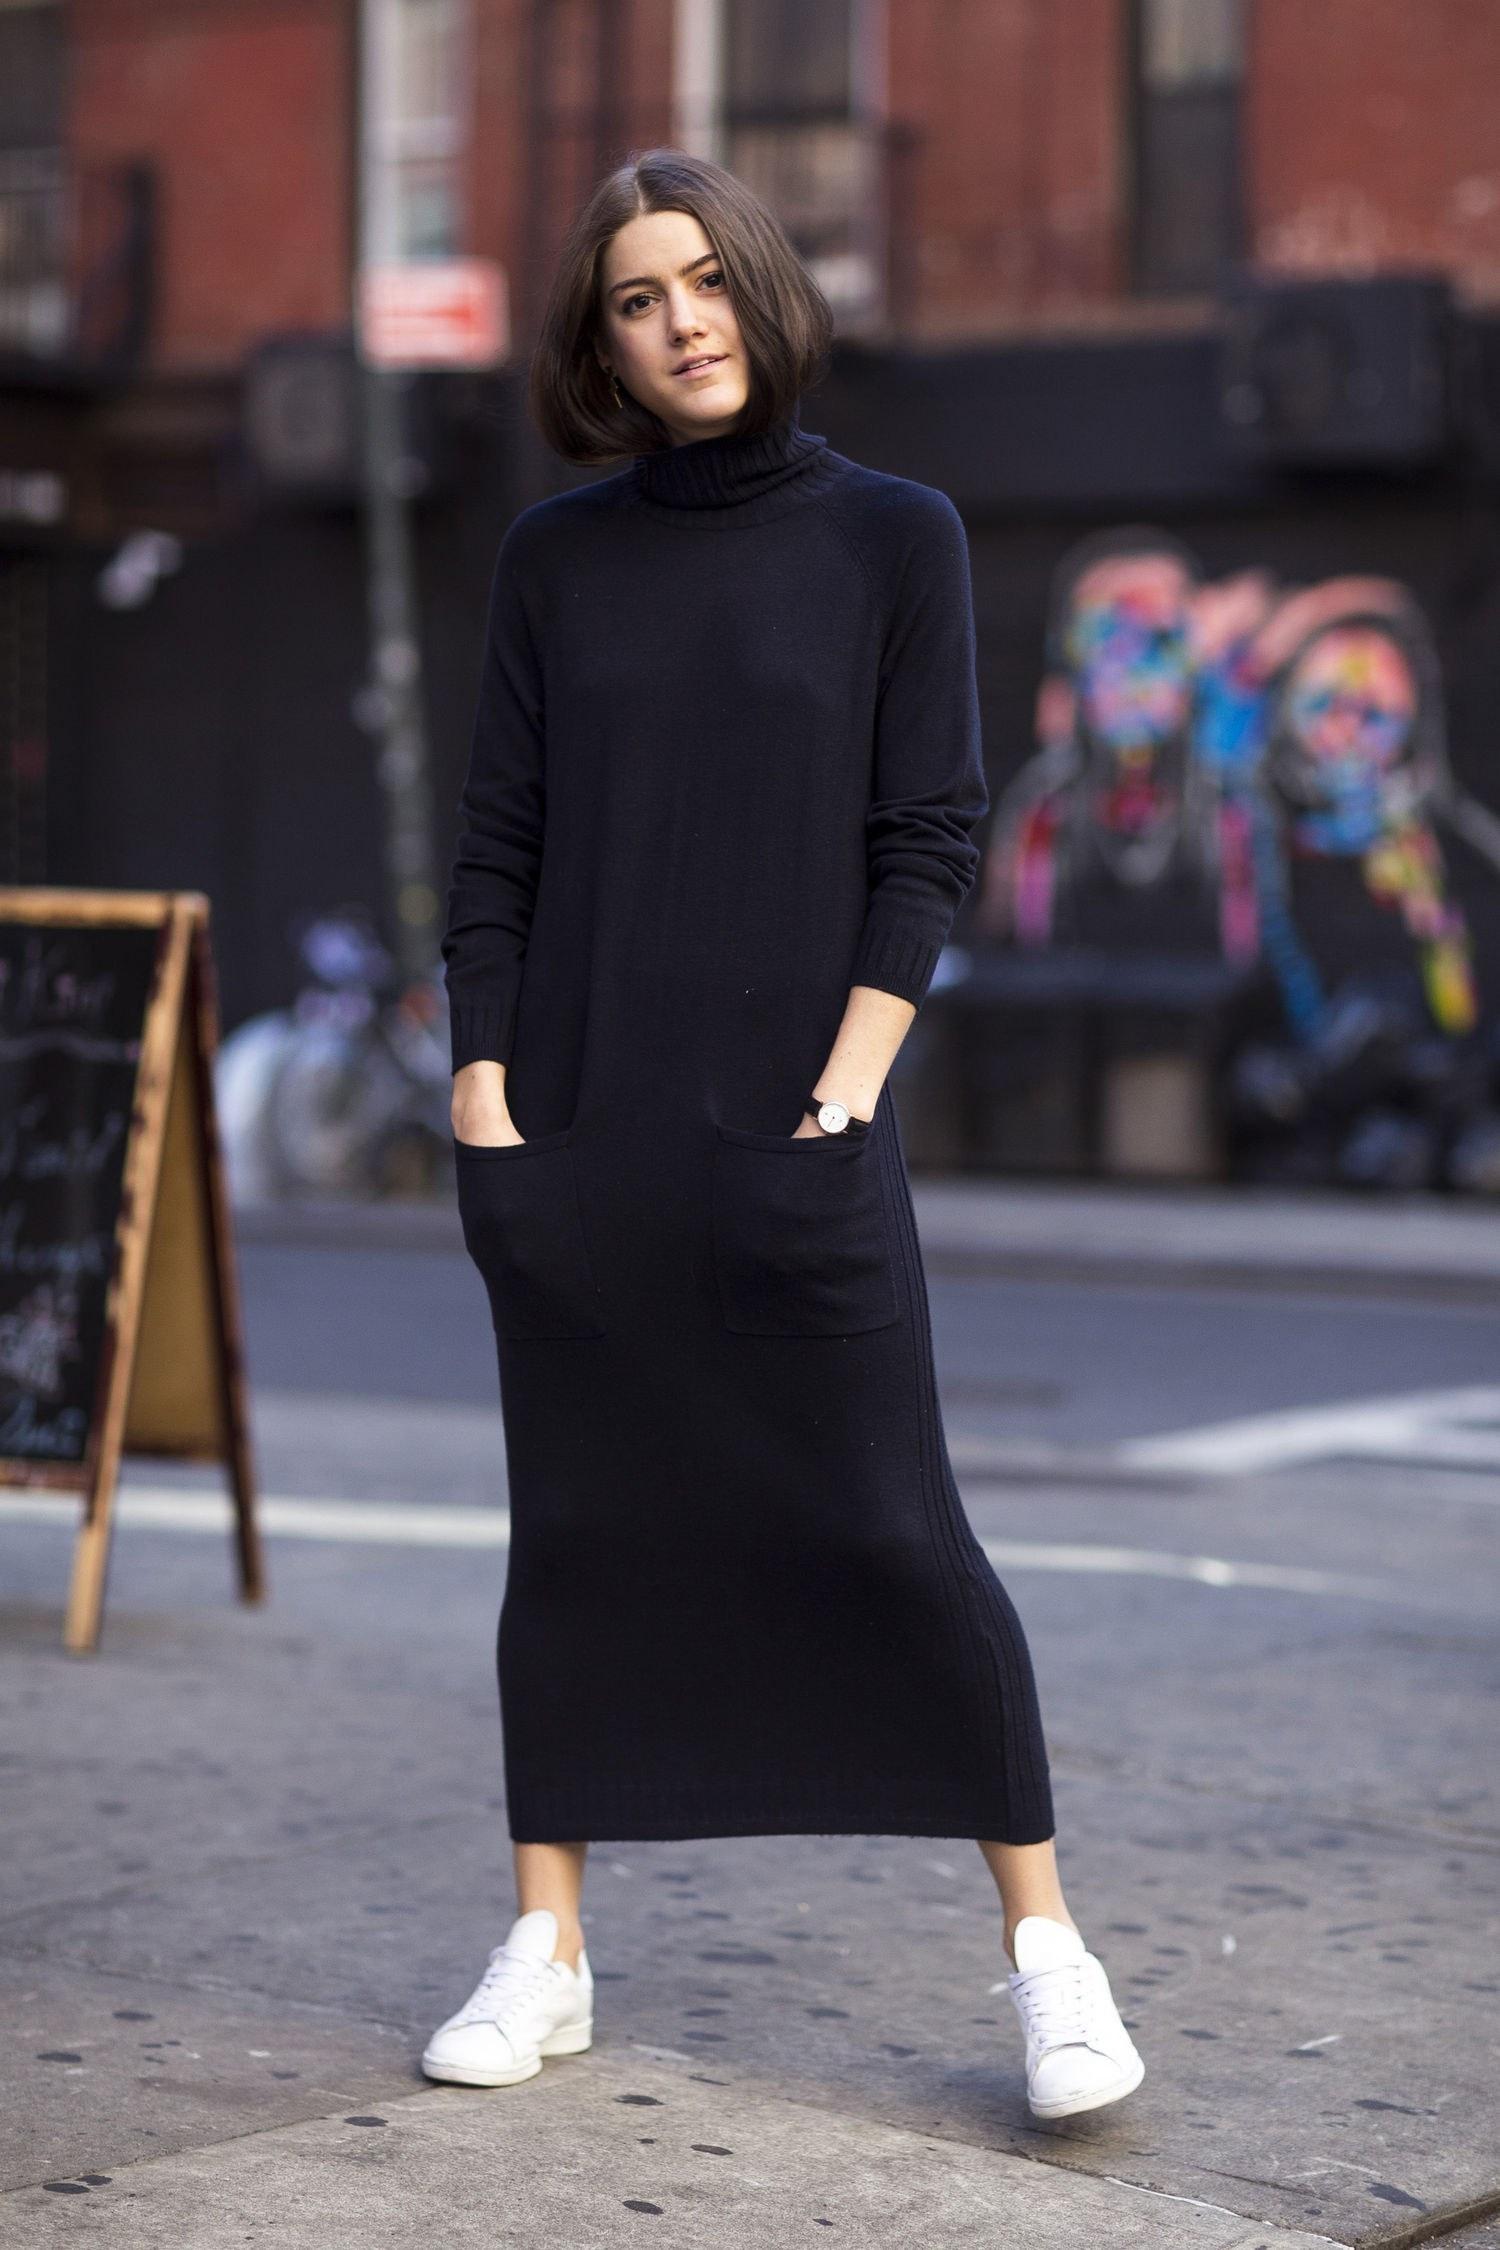 Emma-Sousa-wear-dresses-in-winter-glamour.com_